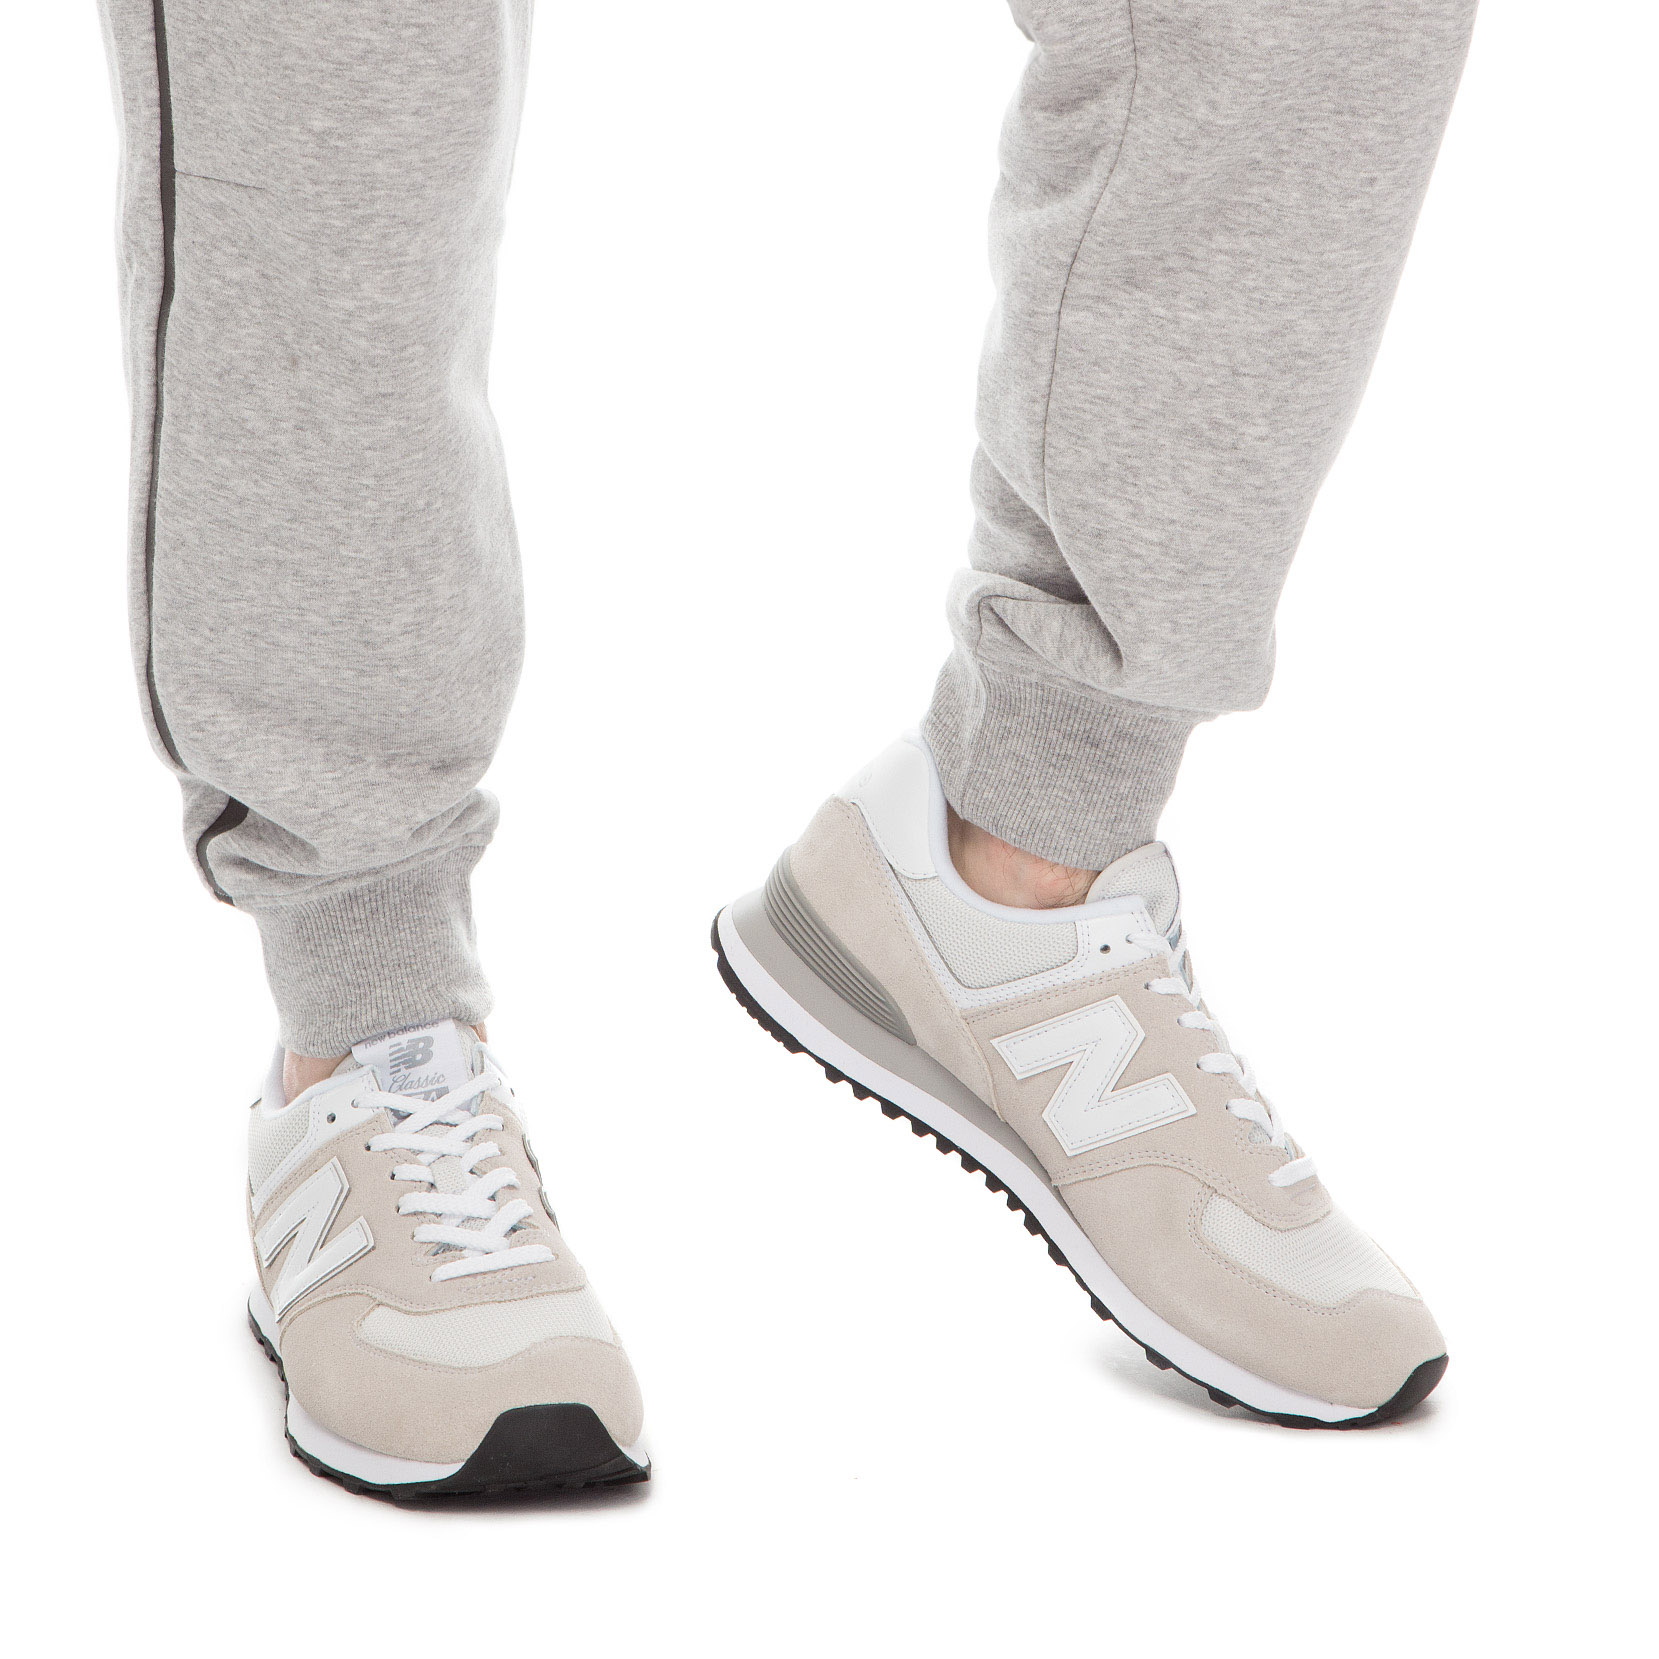 brand new f0e57 38eec Чоловіче взуття повсякденне New Balance 574 ML574EGW | New ...